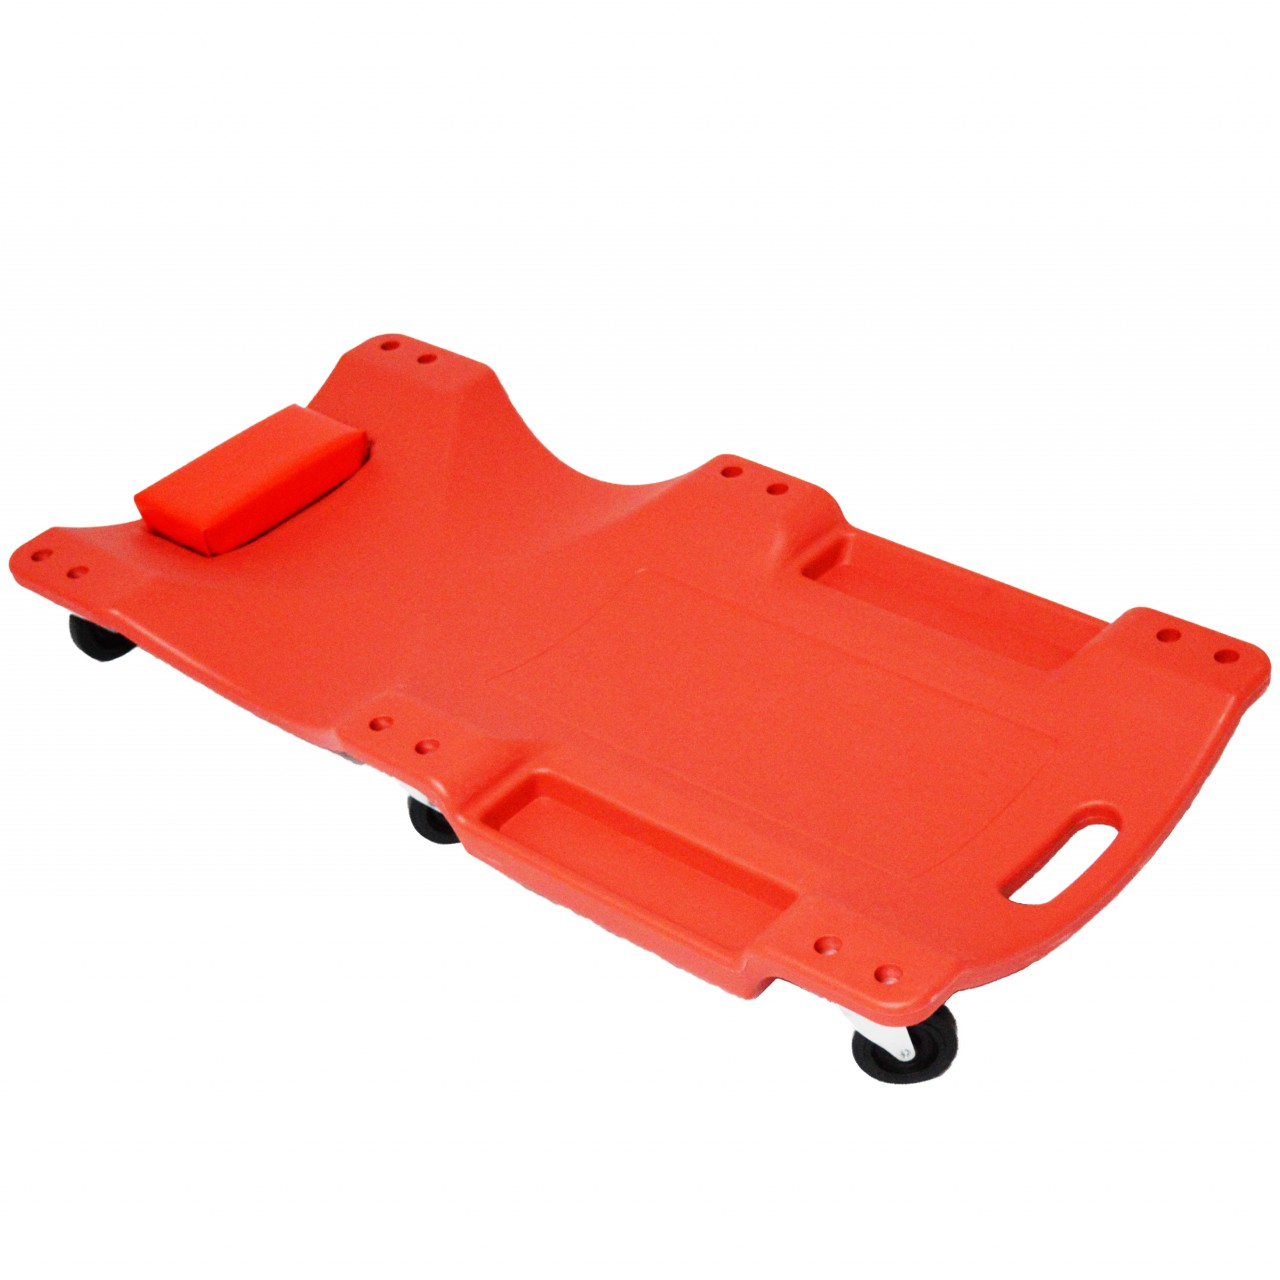 kfz-rollbrett belastbarkeit 150 kg 102 cm